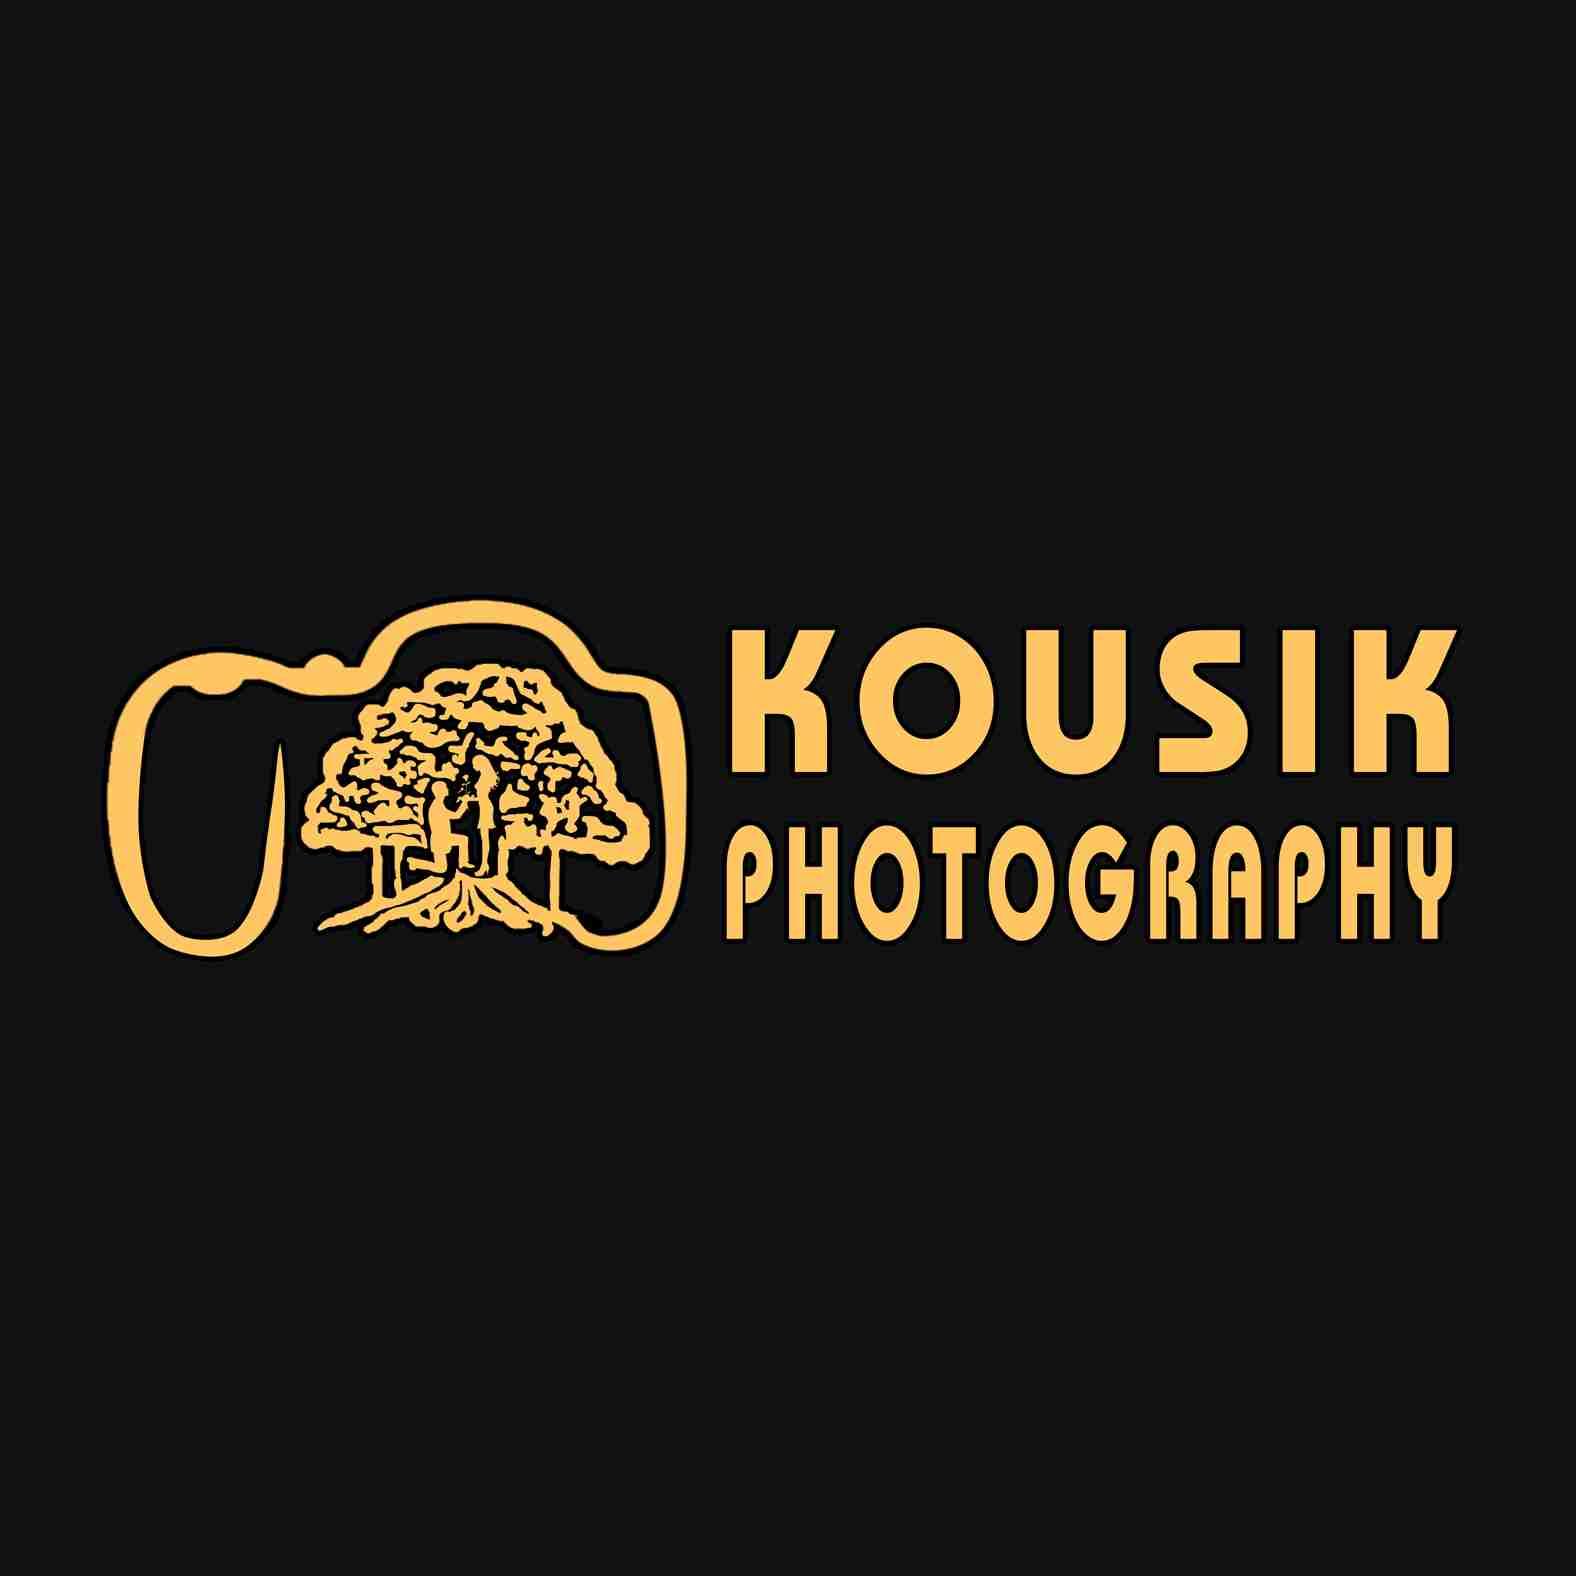 Kousik Photography